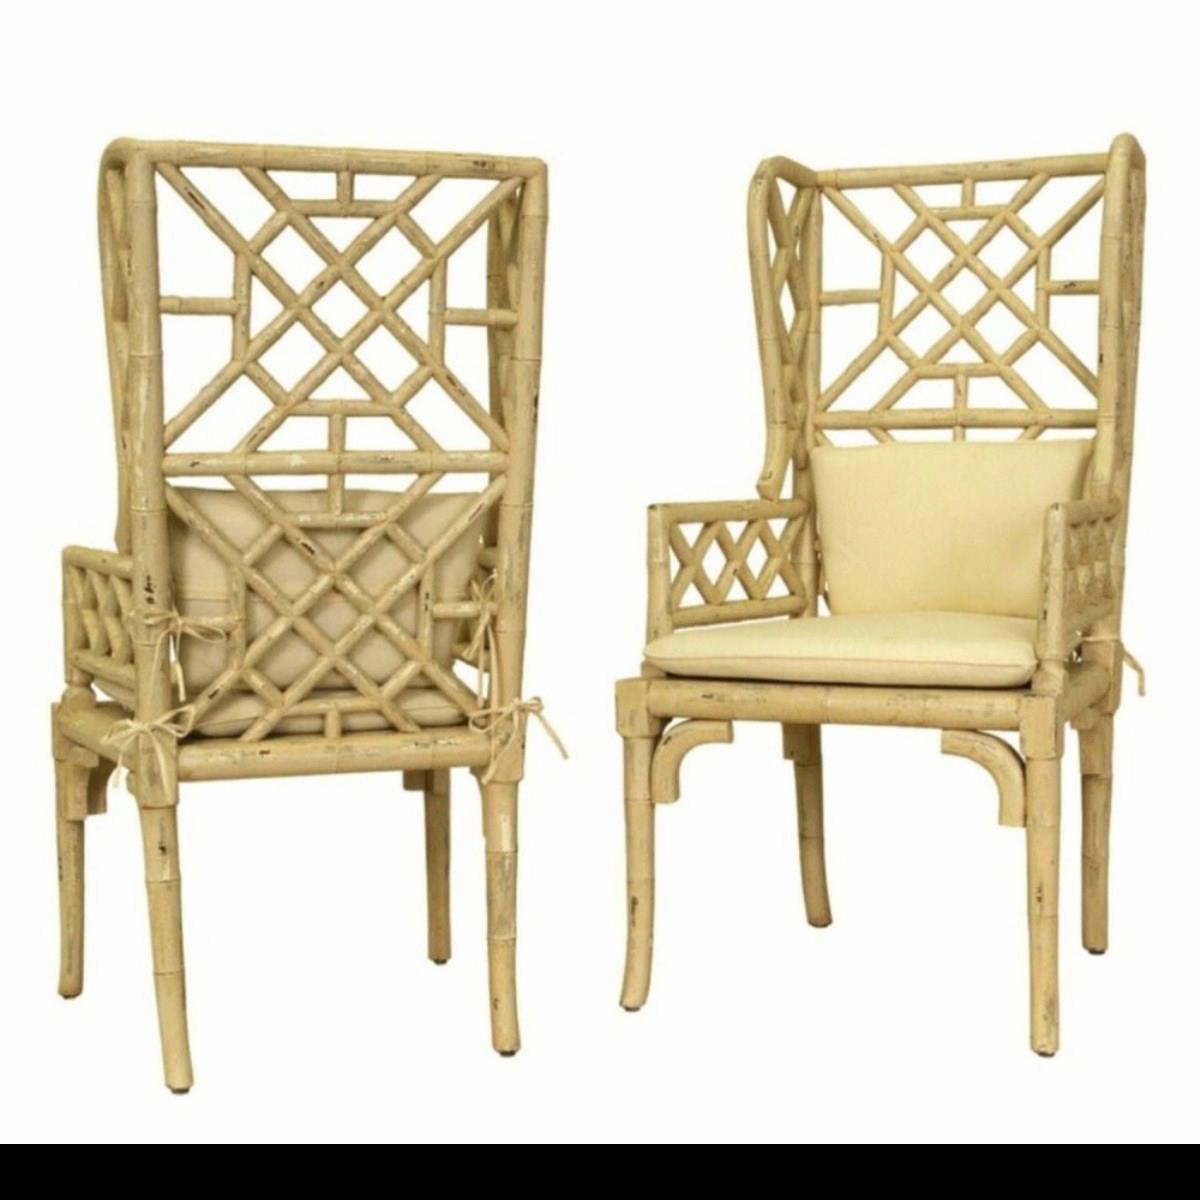 Aidan_Gray_unique_accent_furniture_high_design_settee